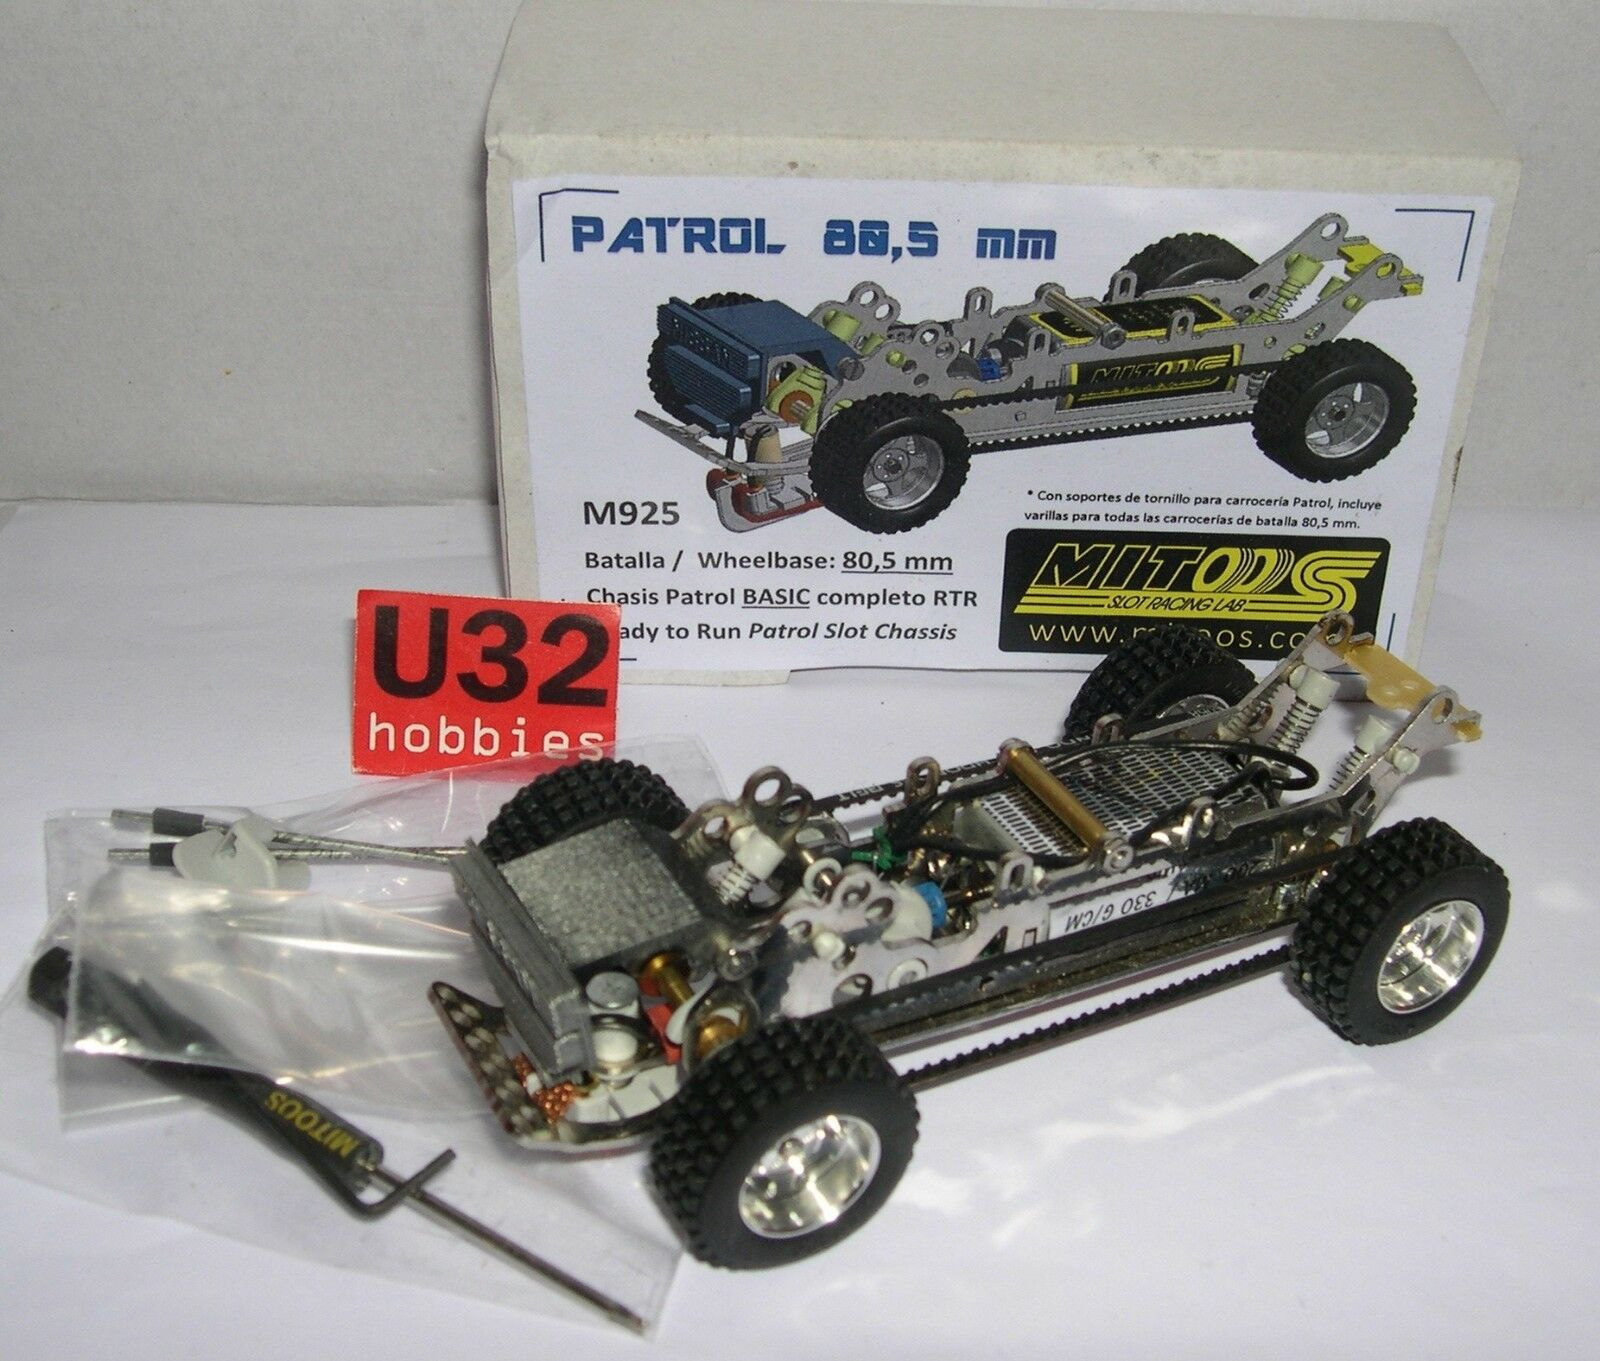 MITOOS M925 Chassis RAID PATROL BASIC RTR Schlacht 80.5mm